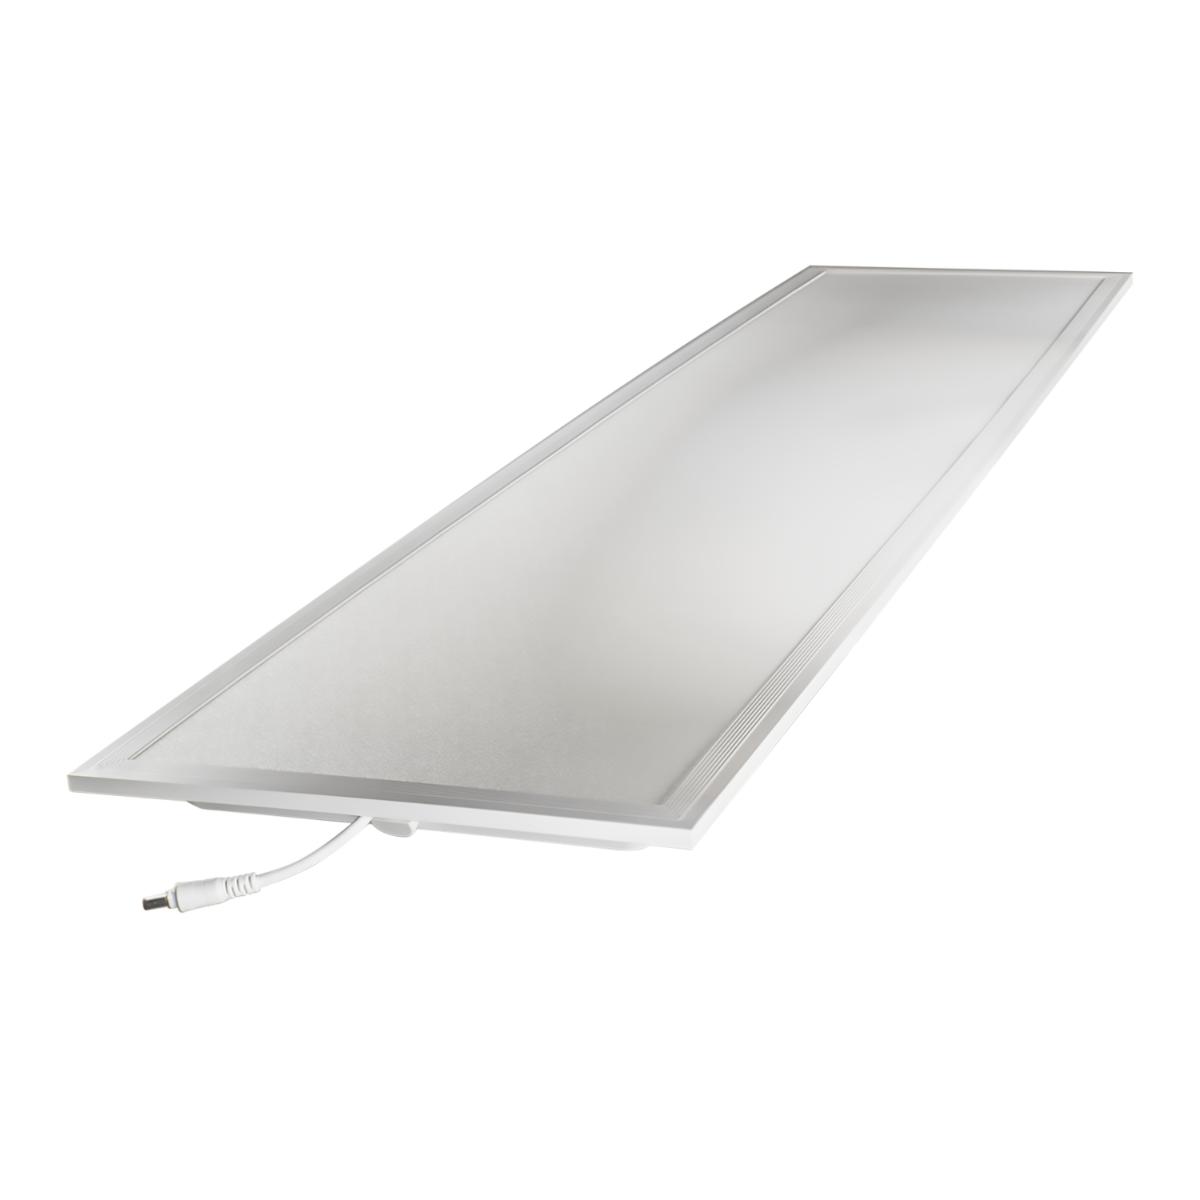 Noxion Delta Pro Panel LED UGR<19 V2.0 30W 4110lm 4000K 300x1200+ GST18 Macho + Xitanium | Blanco Frio